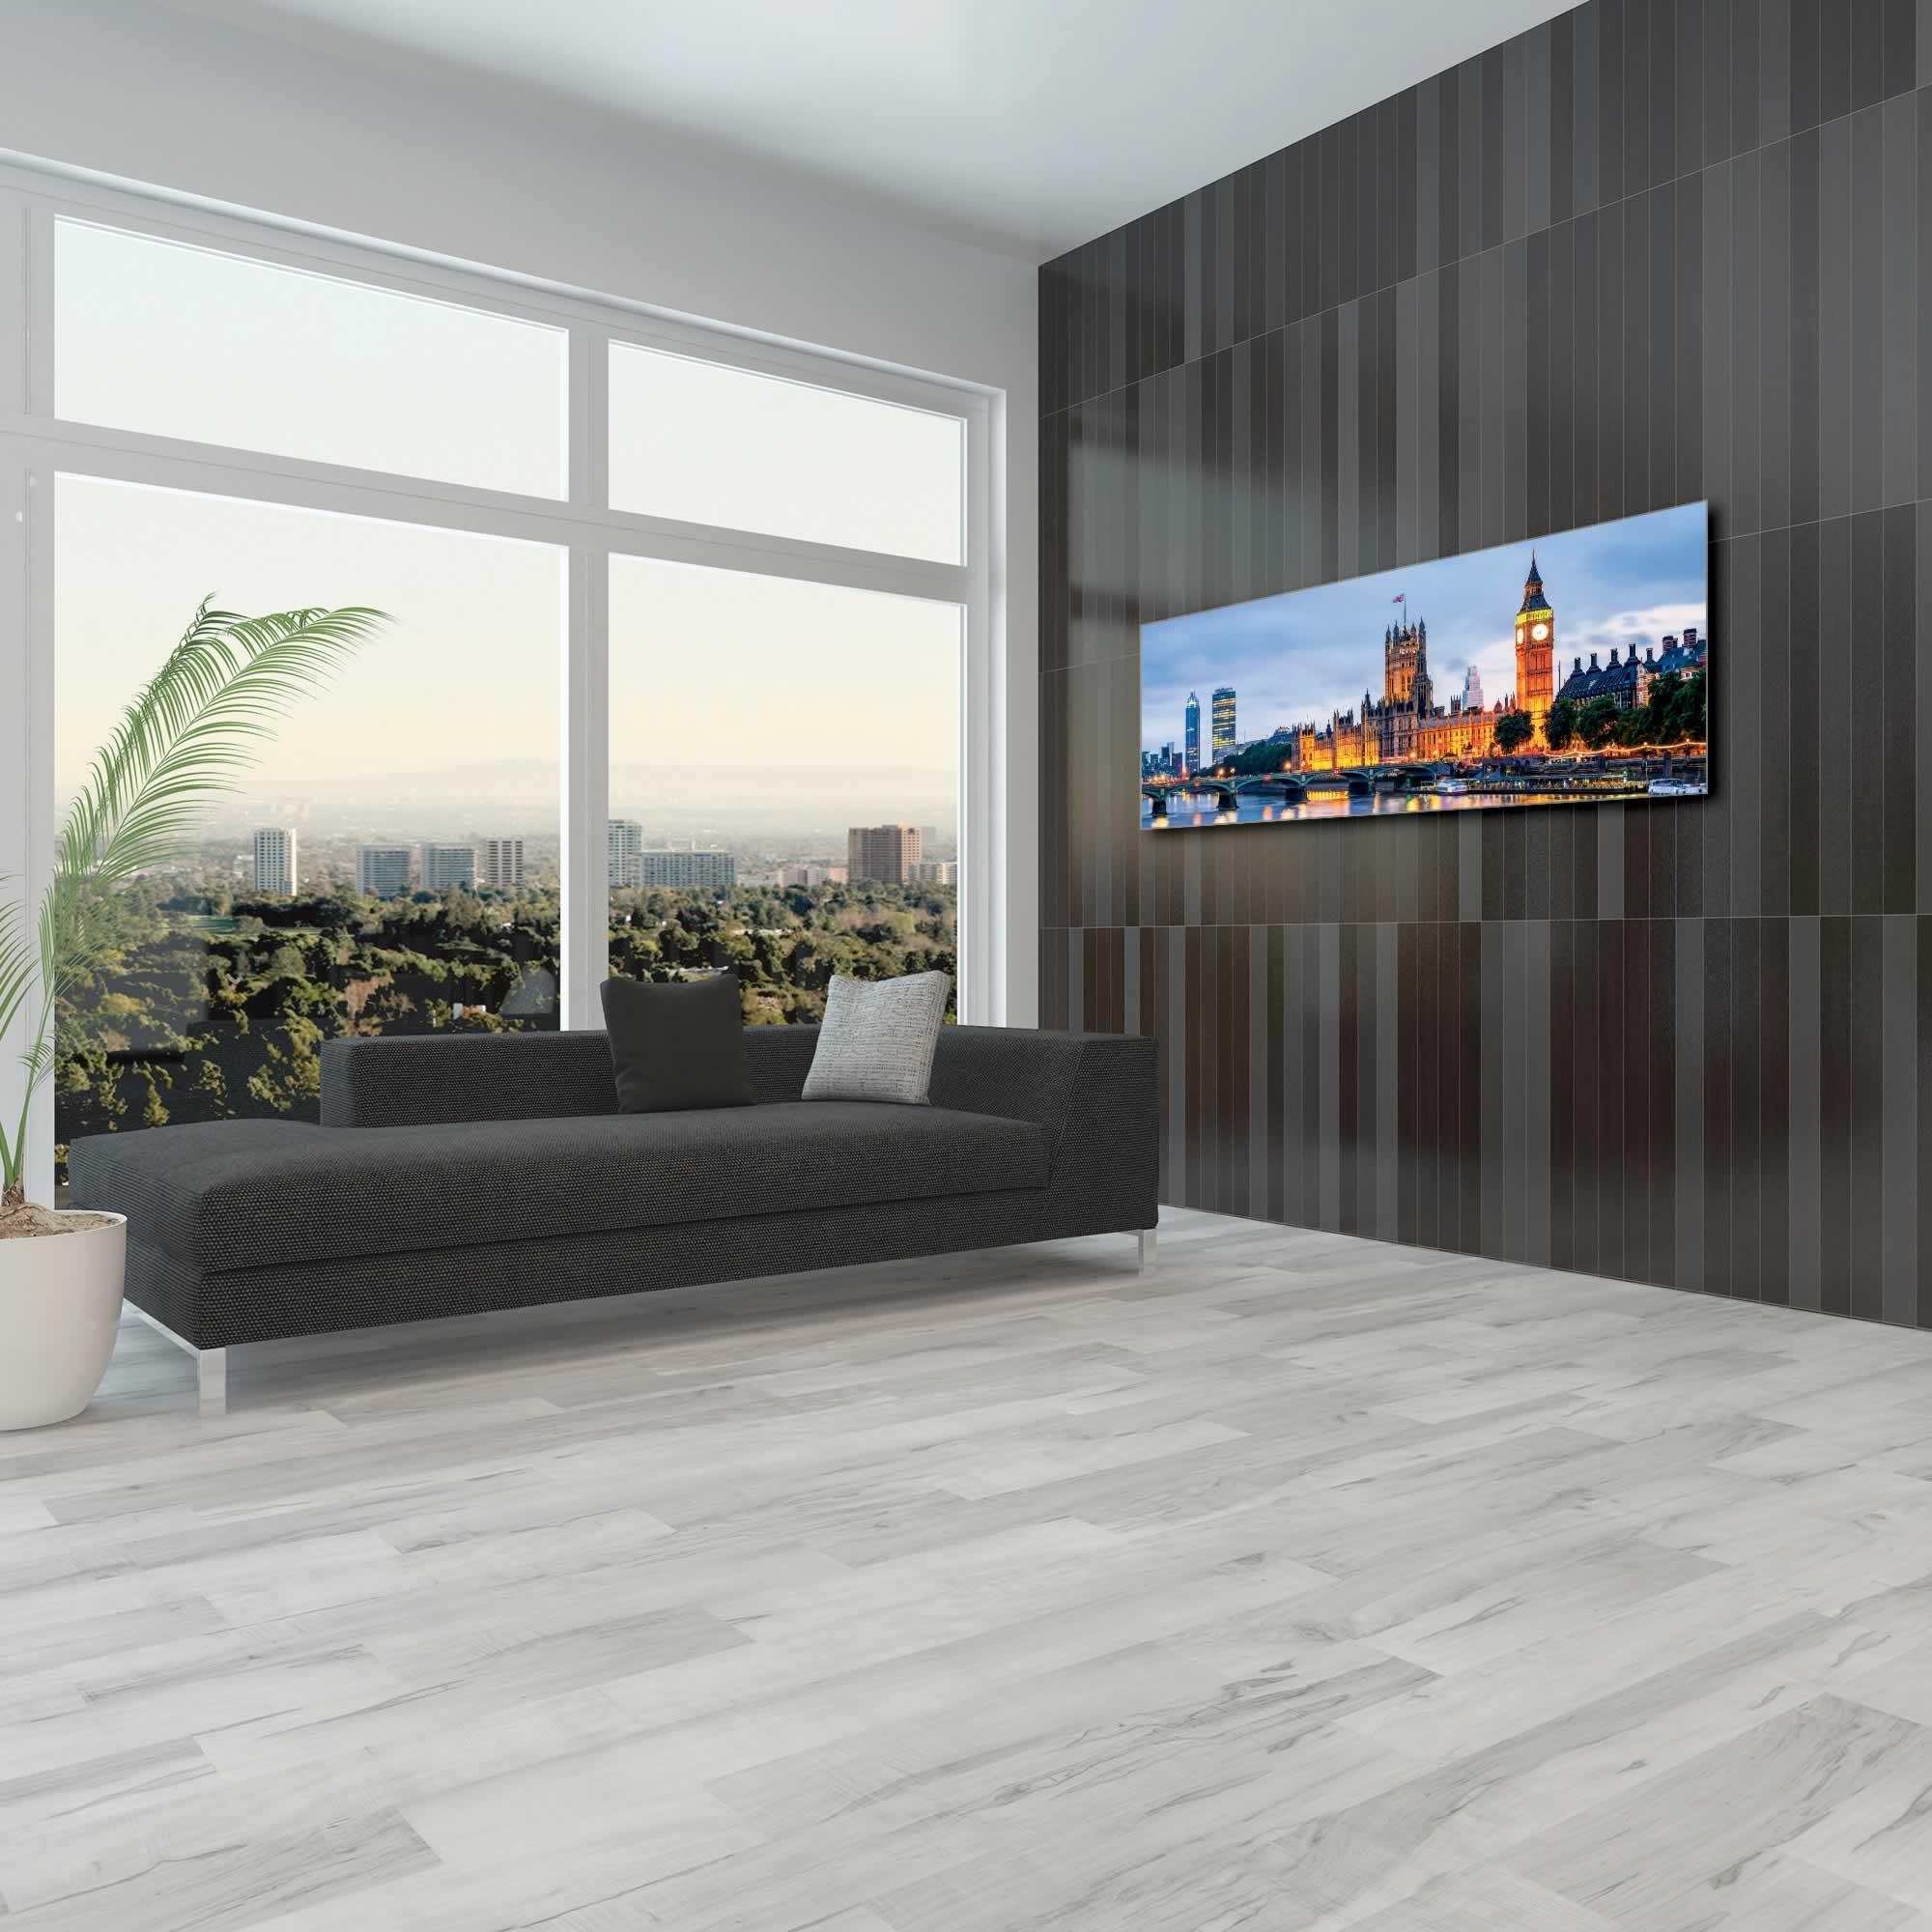 Classic London City Skyline - Urban Modern Art, Designer Home Decor, Cityscape Wall Artwork, Trendy Contemporary Art - Alternate View 1